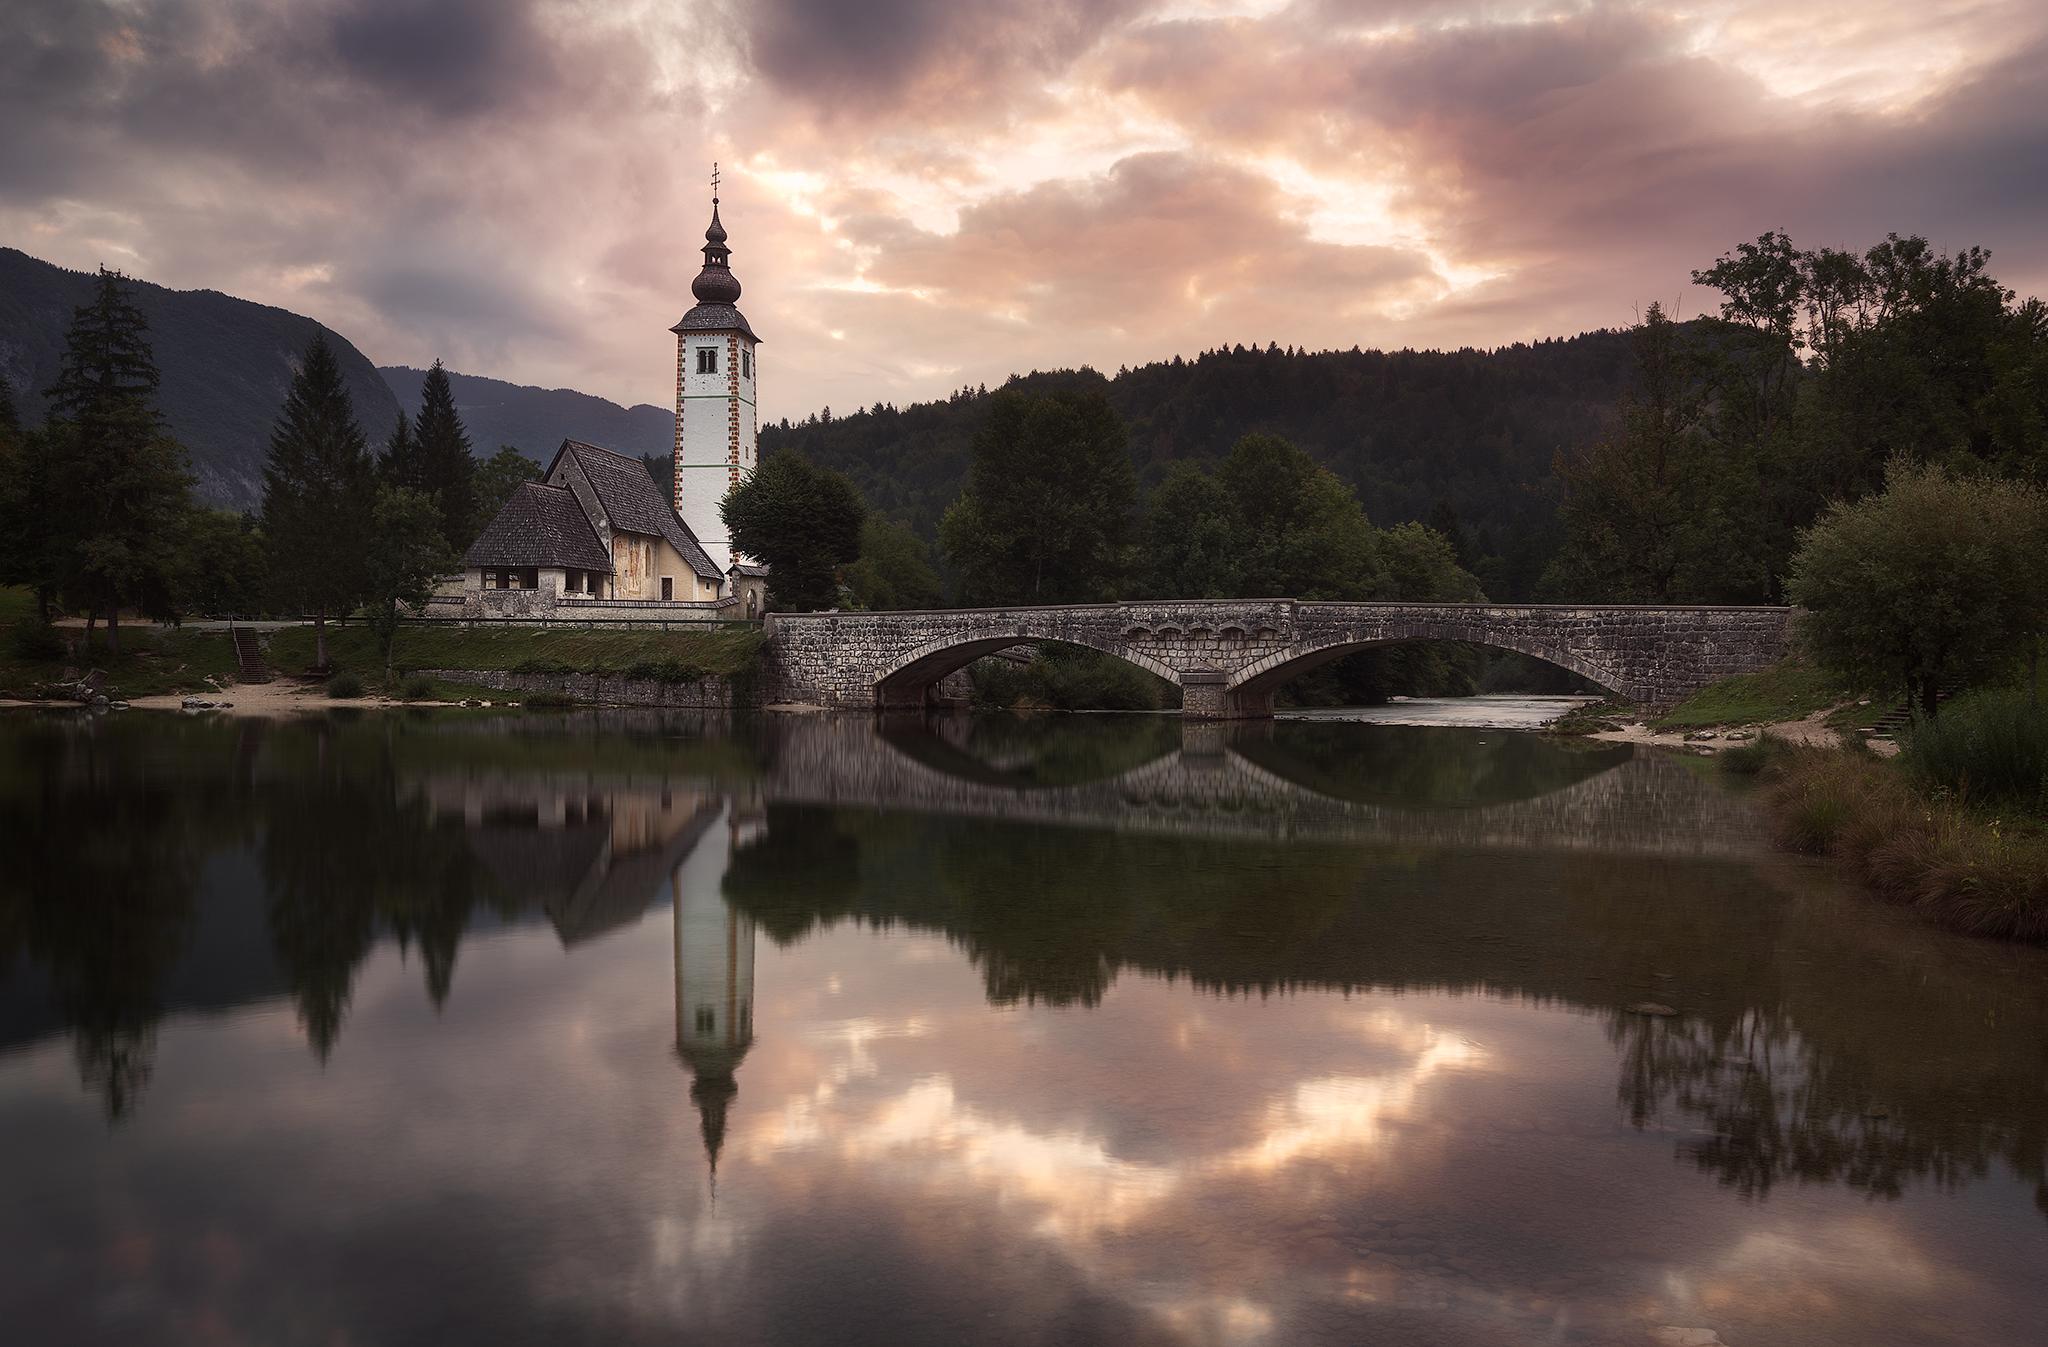 The church of Bohinj, Slovenia